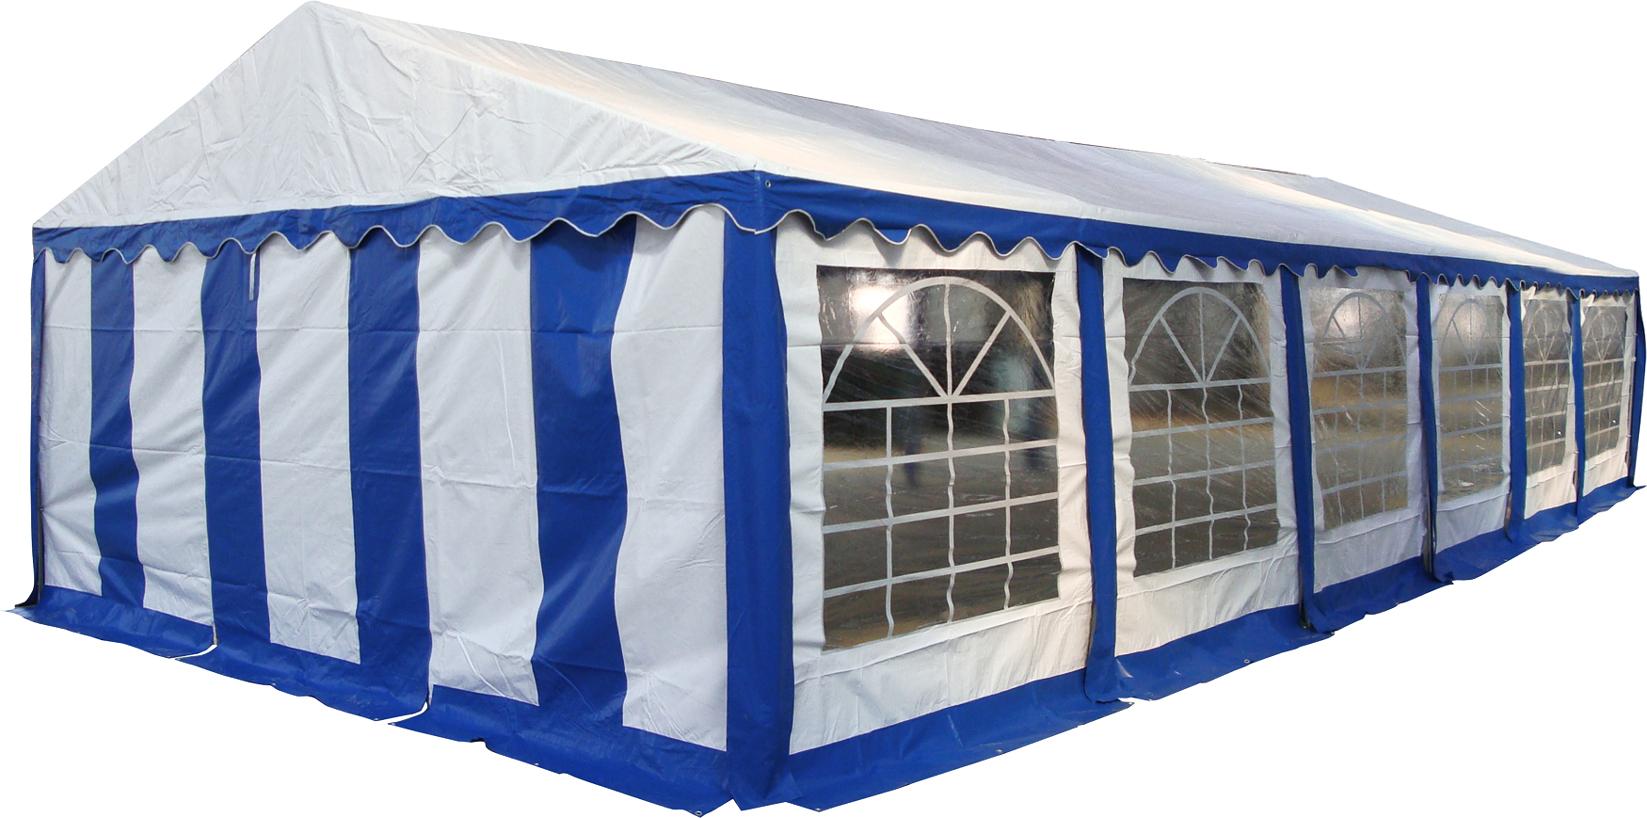 Купить Тент-шатер Sundays, 512201, Китай